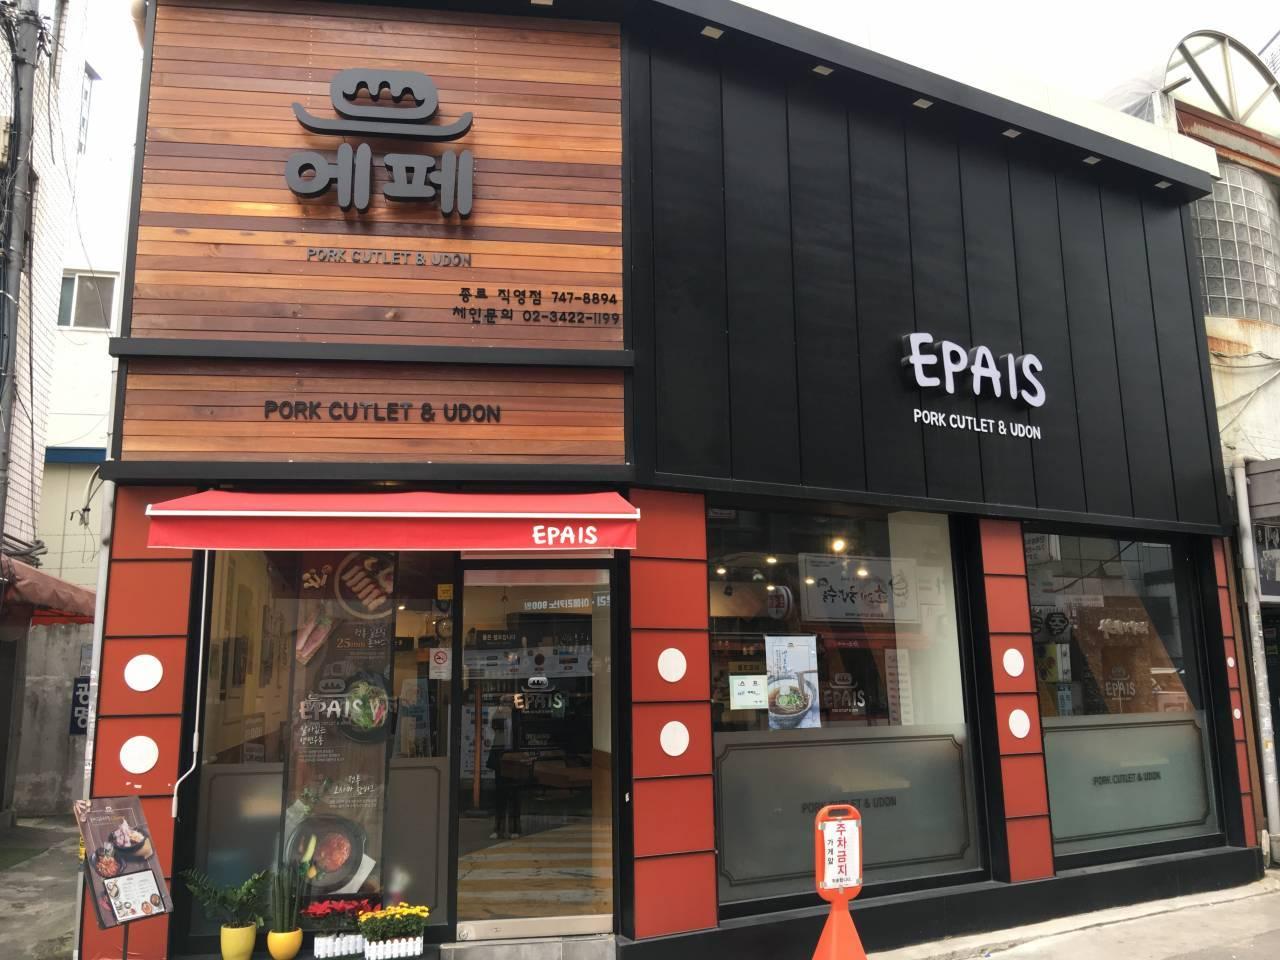 EPAIS(에페)